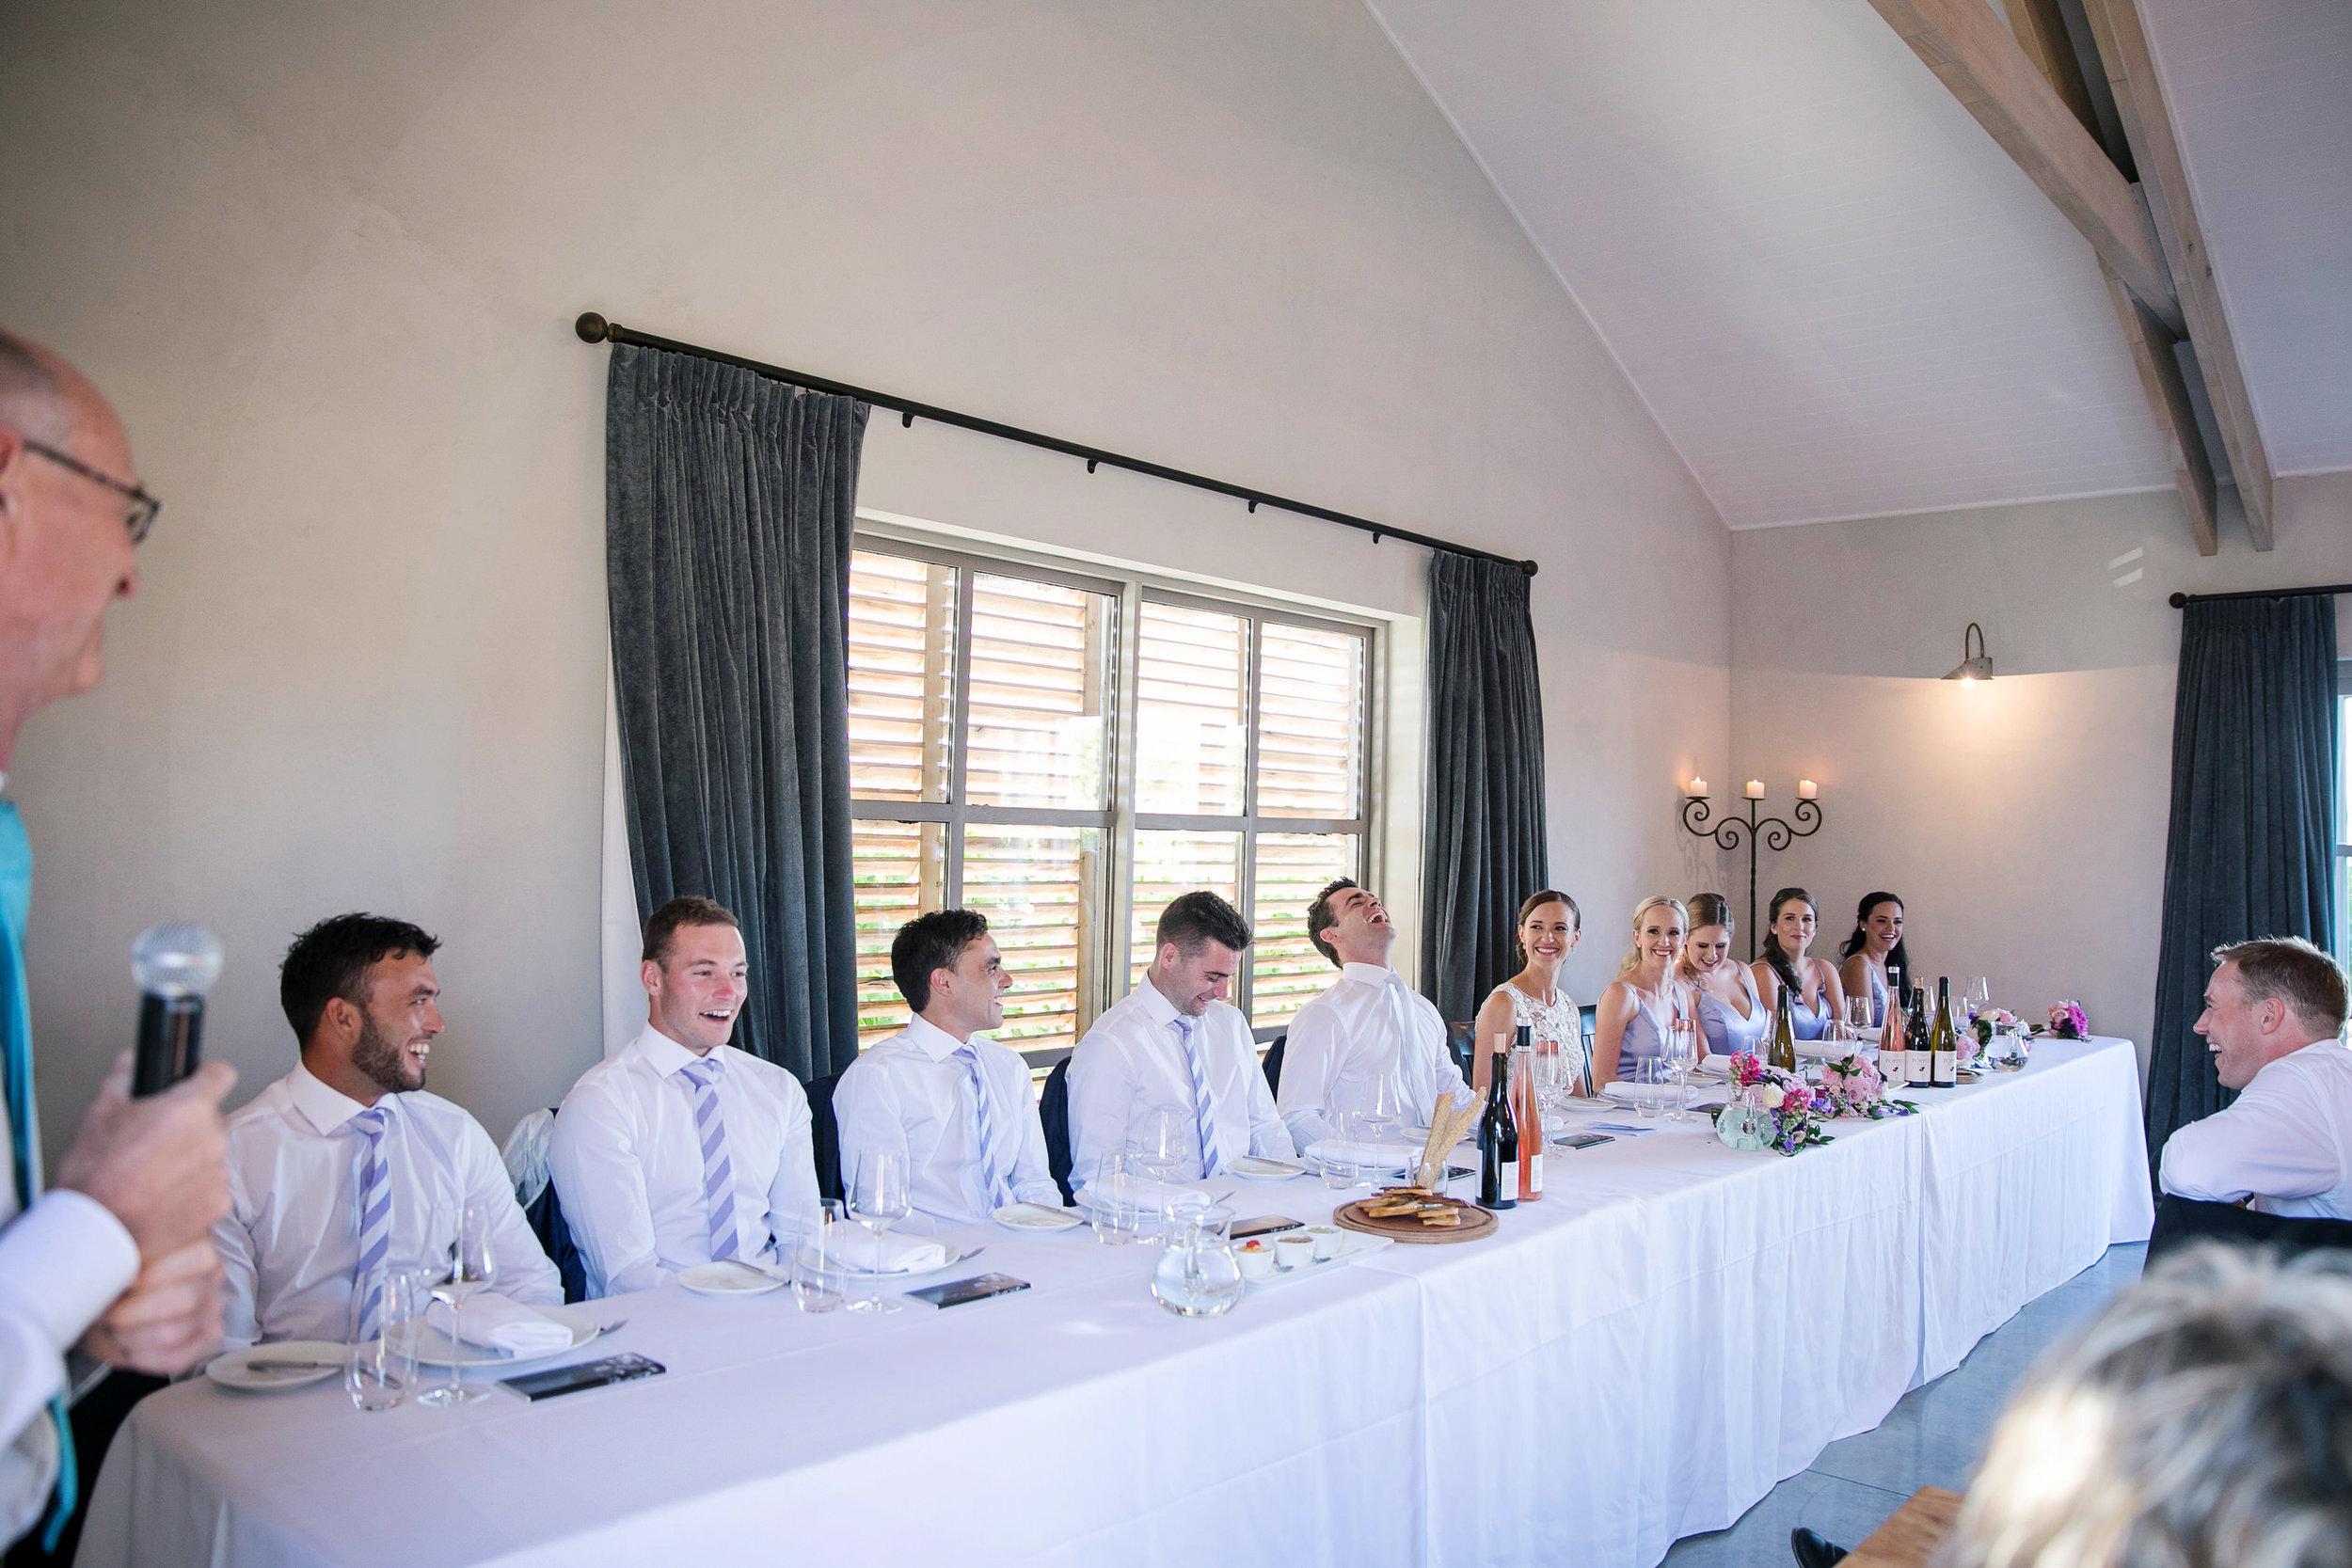 Martinborough-Poppies-Wedding-Caine-Eloise-Toni-Larsen-0127.jpg